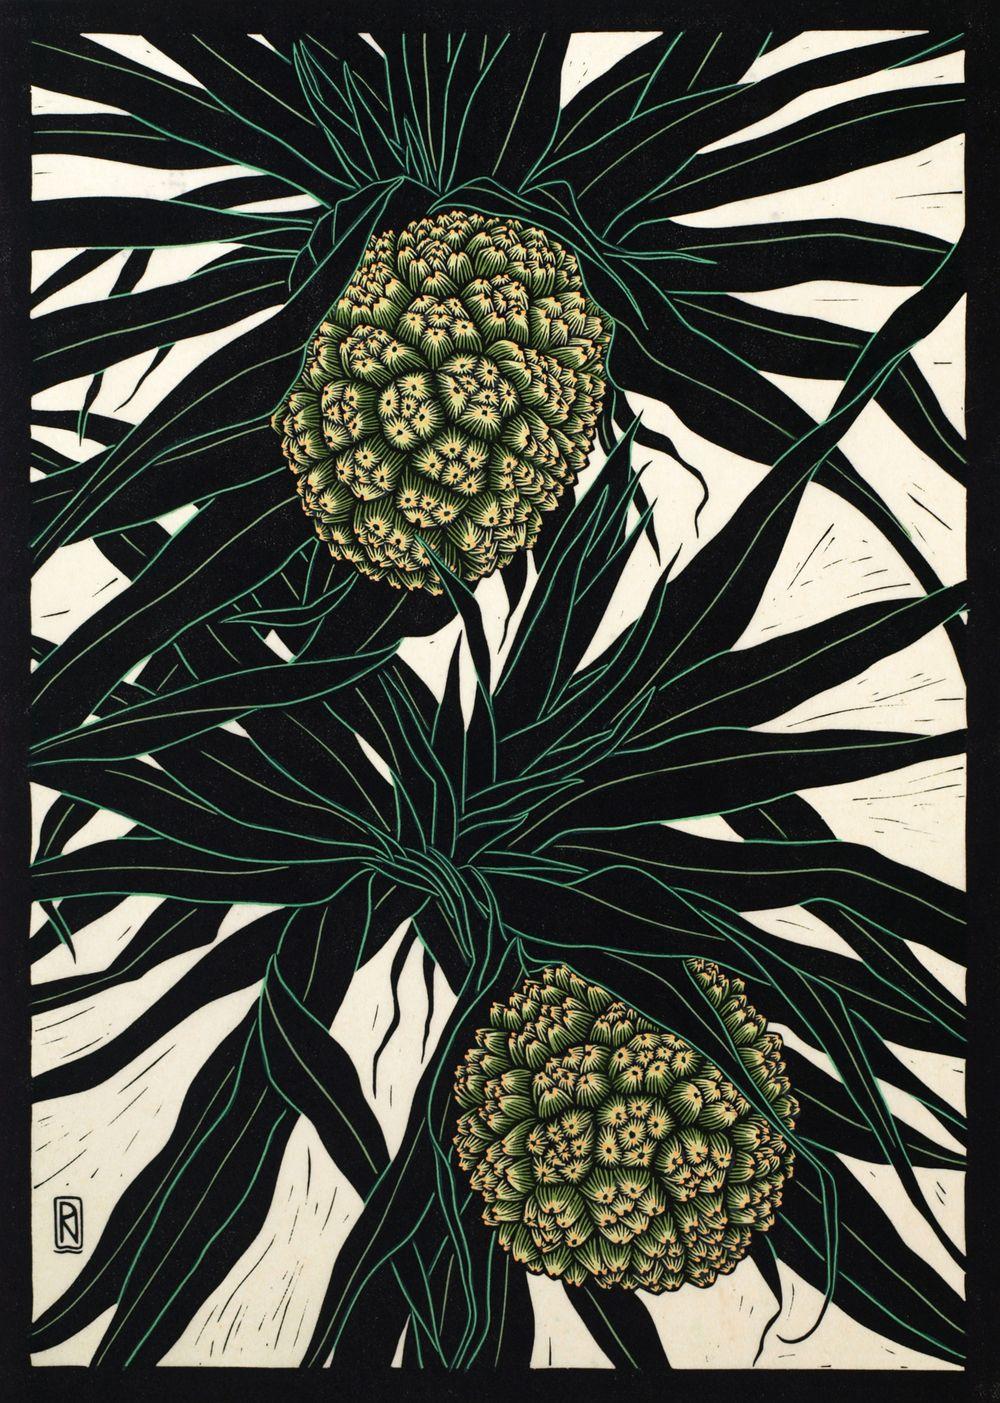 """Pandanus Fruit"" Linocut by Rachel Newling. http://rachelnewling.com/ Tags: Linocut, Cut, Print, Linoleum, Lino, Carving, Block, Woodcut, Helen Elstone, Trees, Leaves, Foliage, Fruit, Exotic."